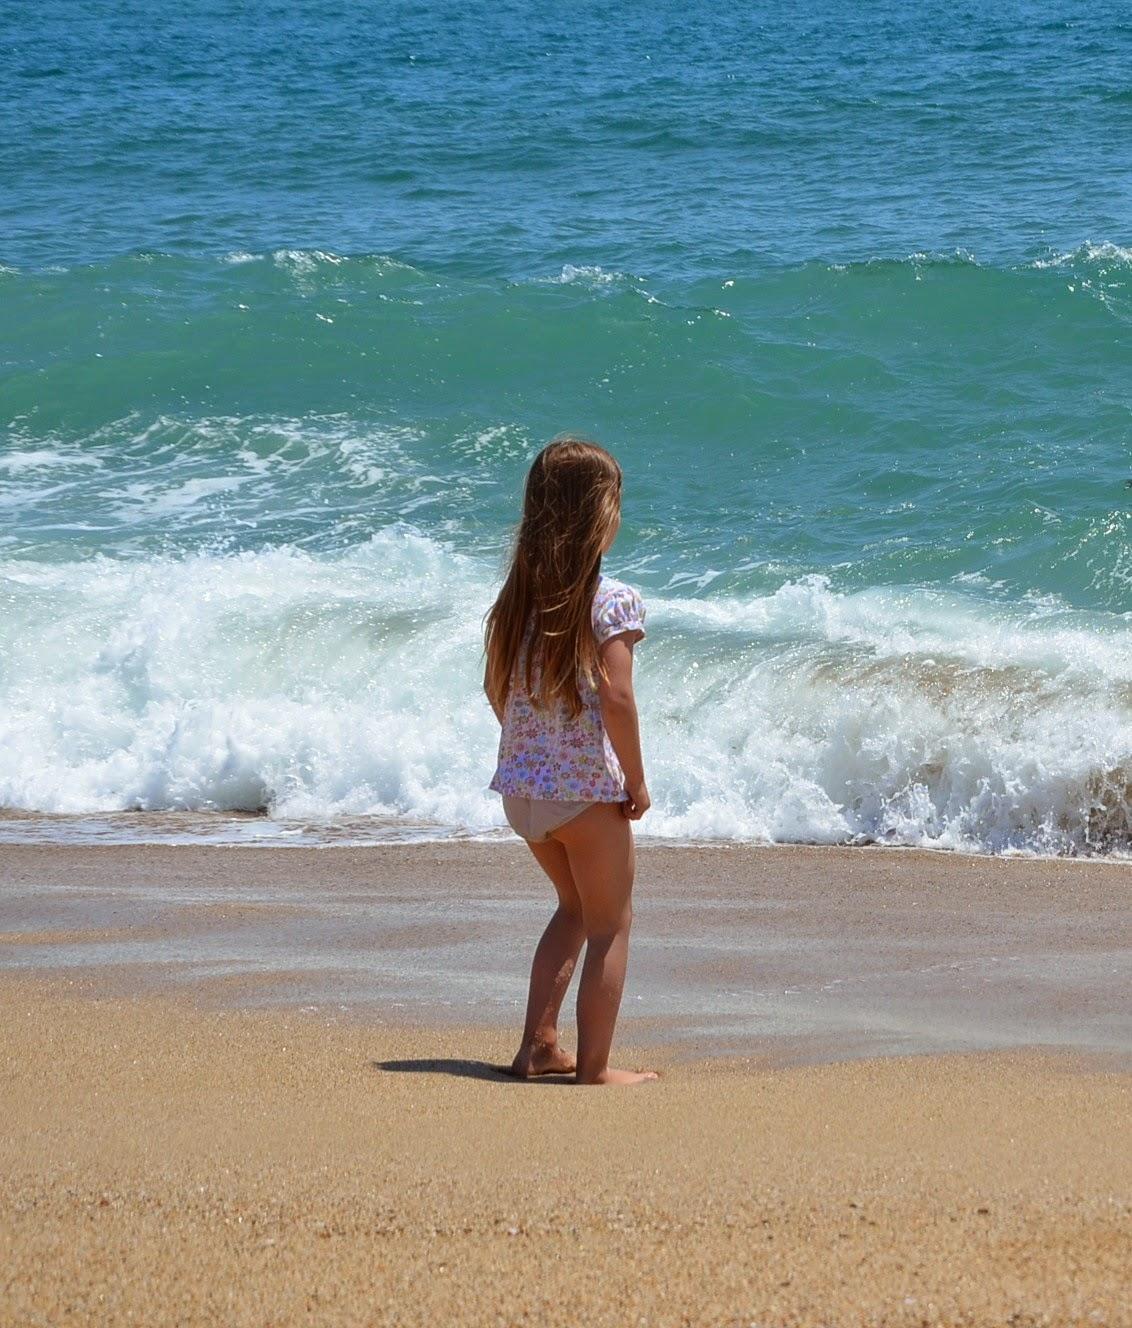 Kind steht am Strand